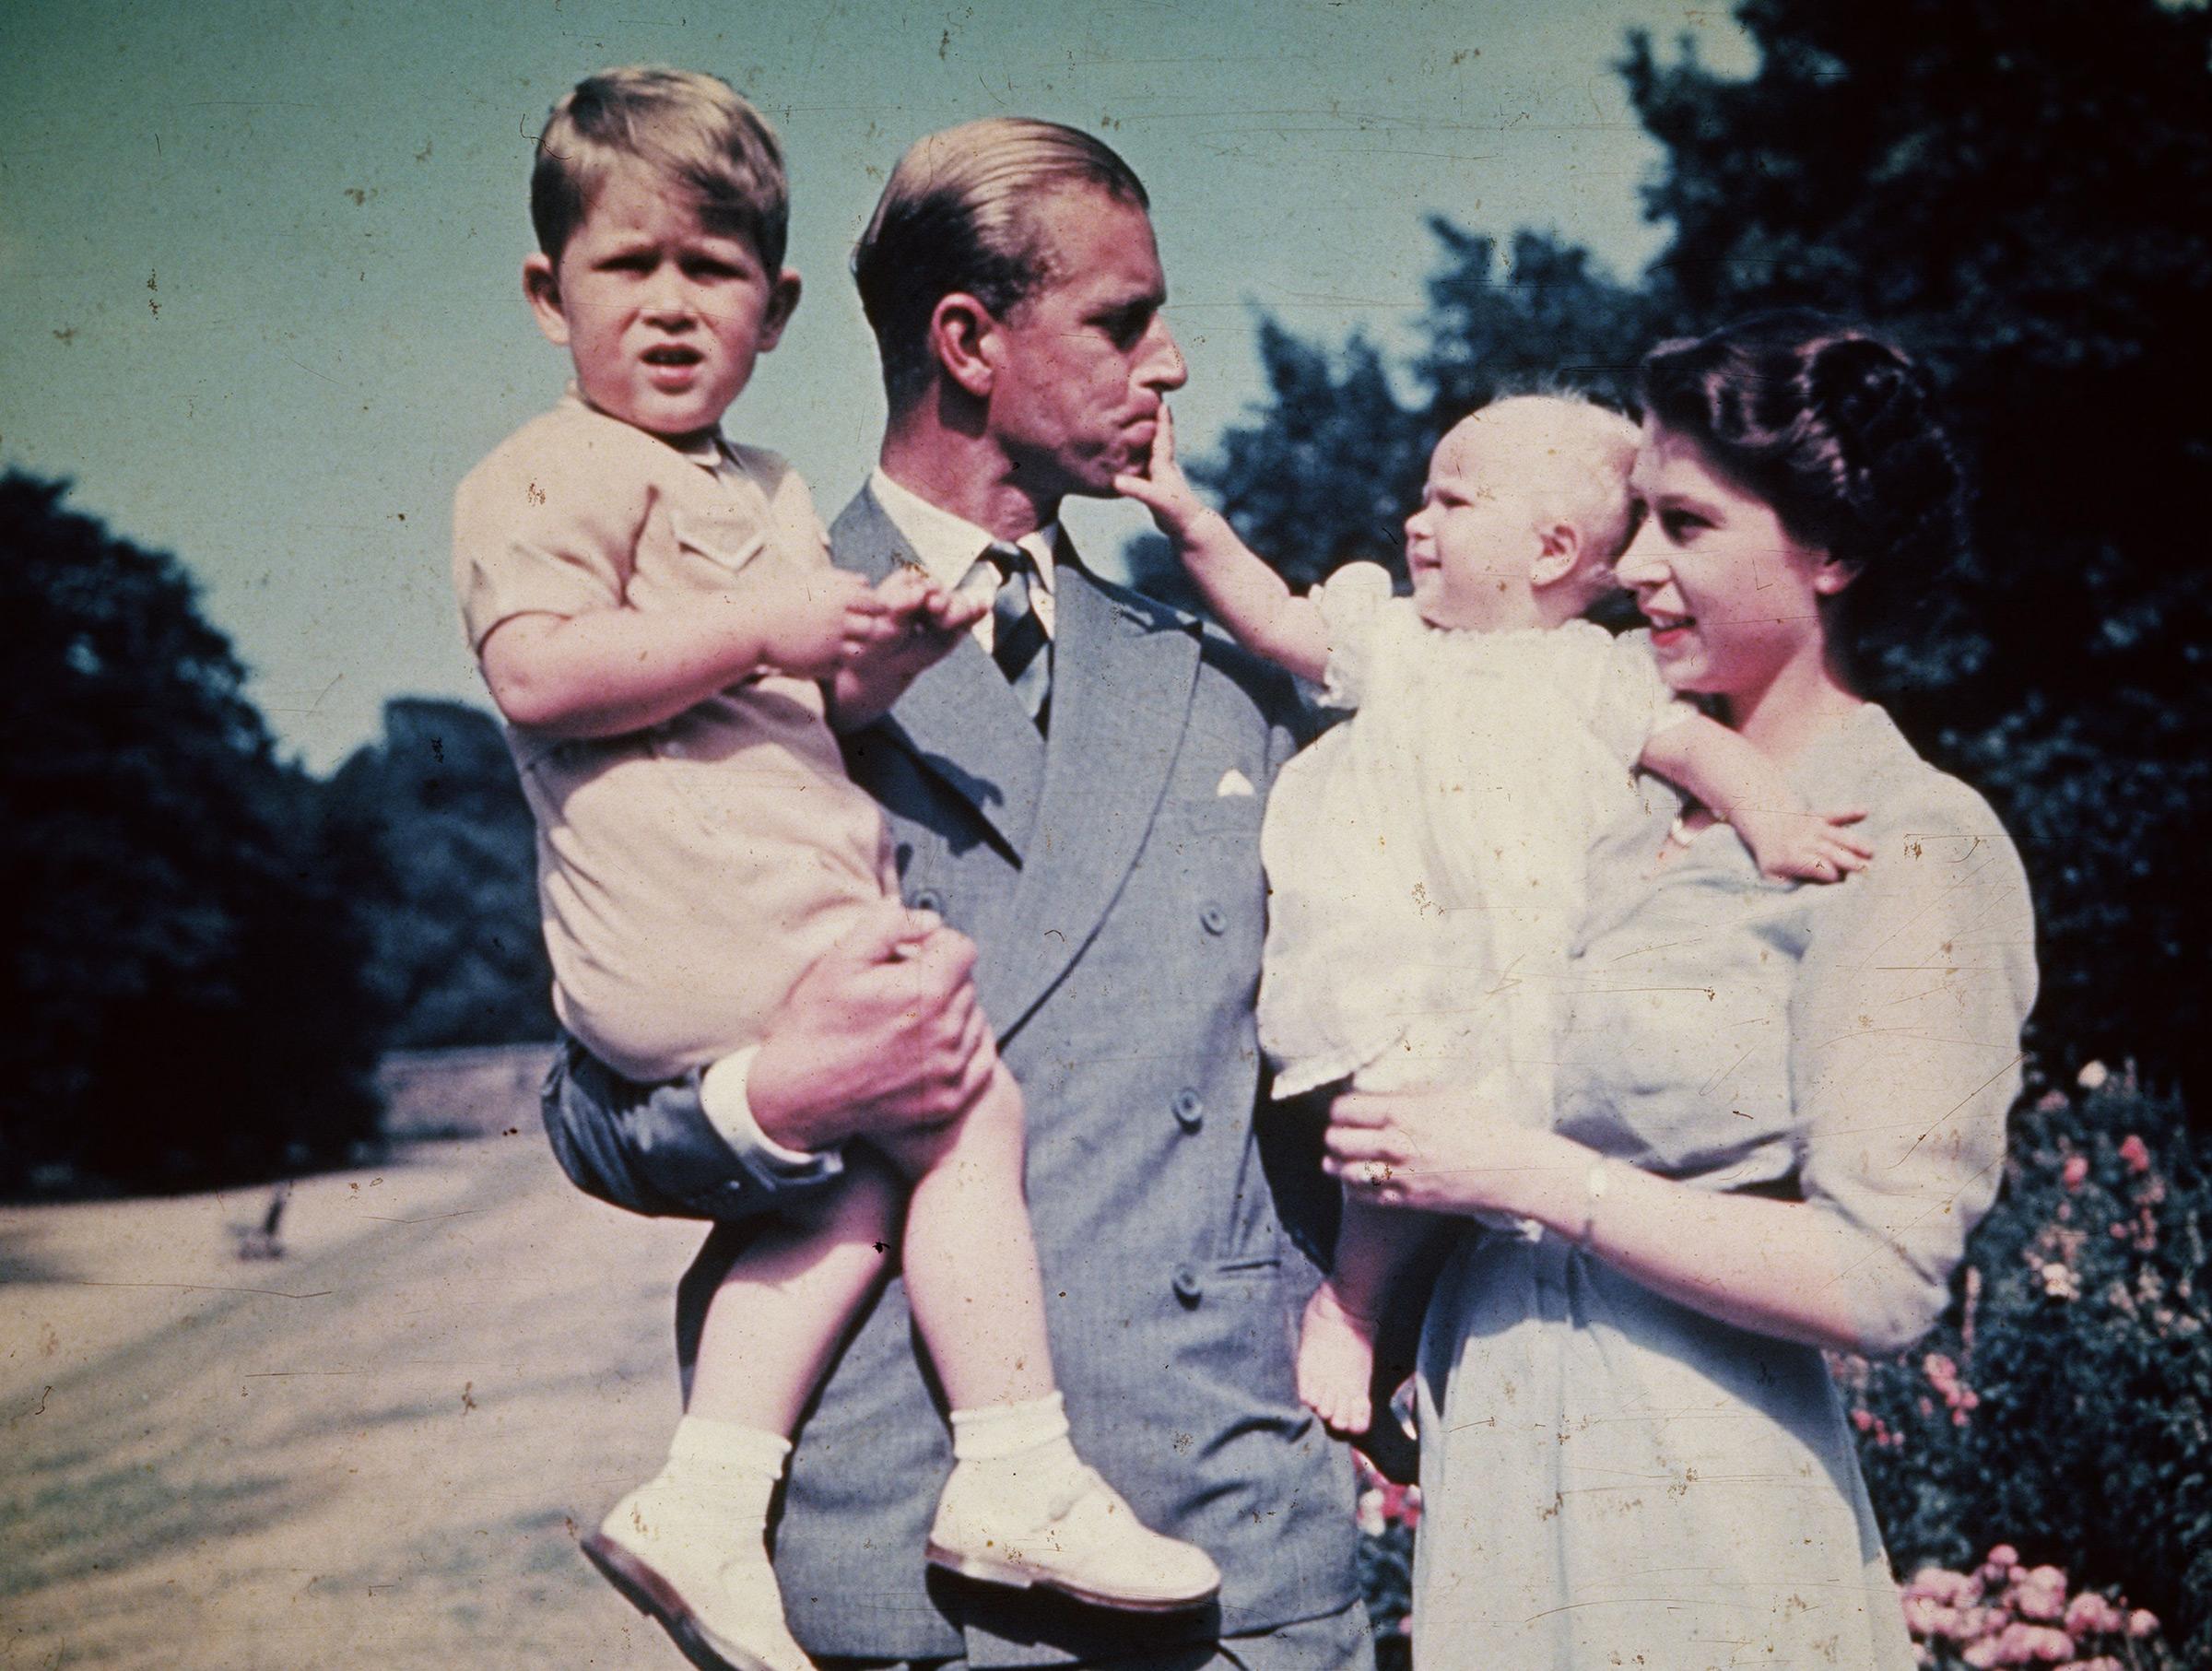 The Duke of Edinburgh and Princess Elizabeth hold their children, Prince Charles and Princess Anne, Aug. 1951.